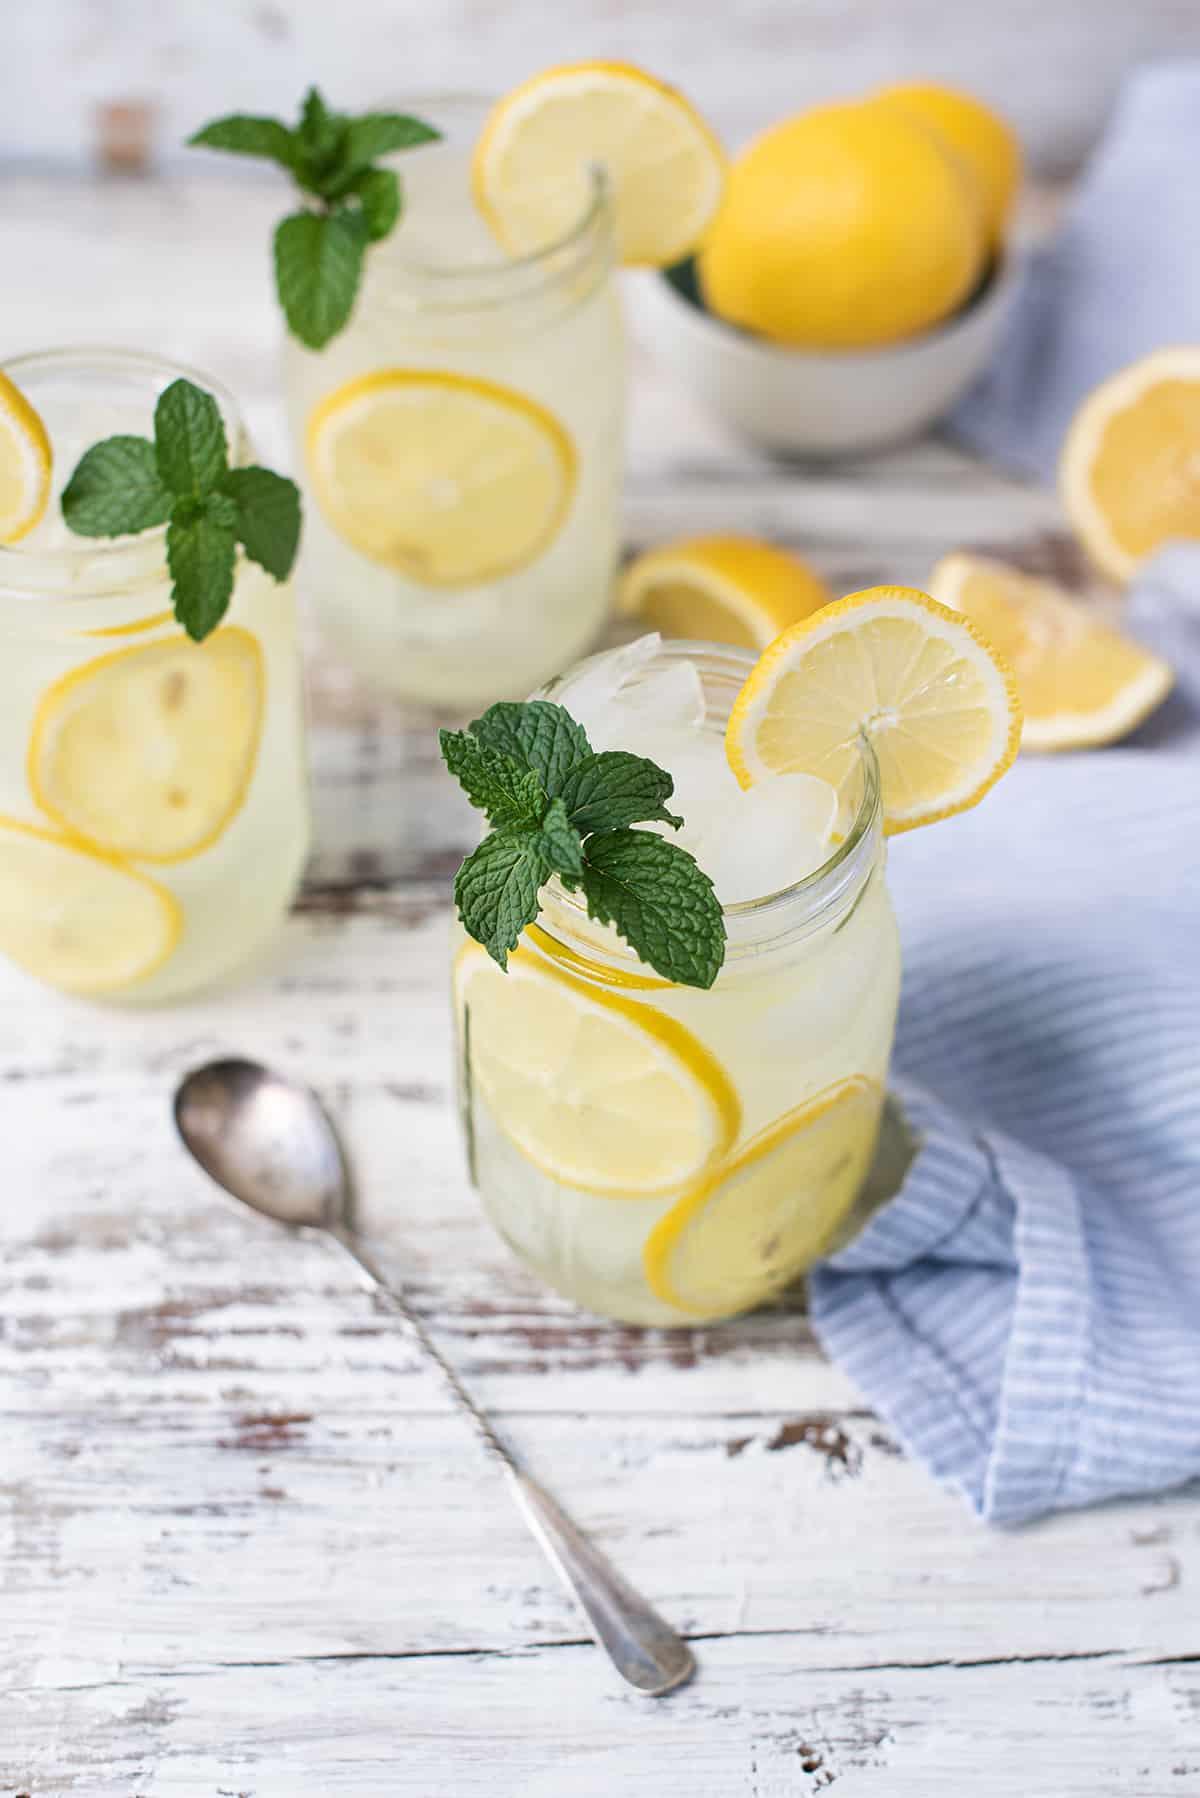 lemonade in mason jars with mint garnish and fresh lemons on white wooden table